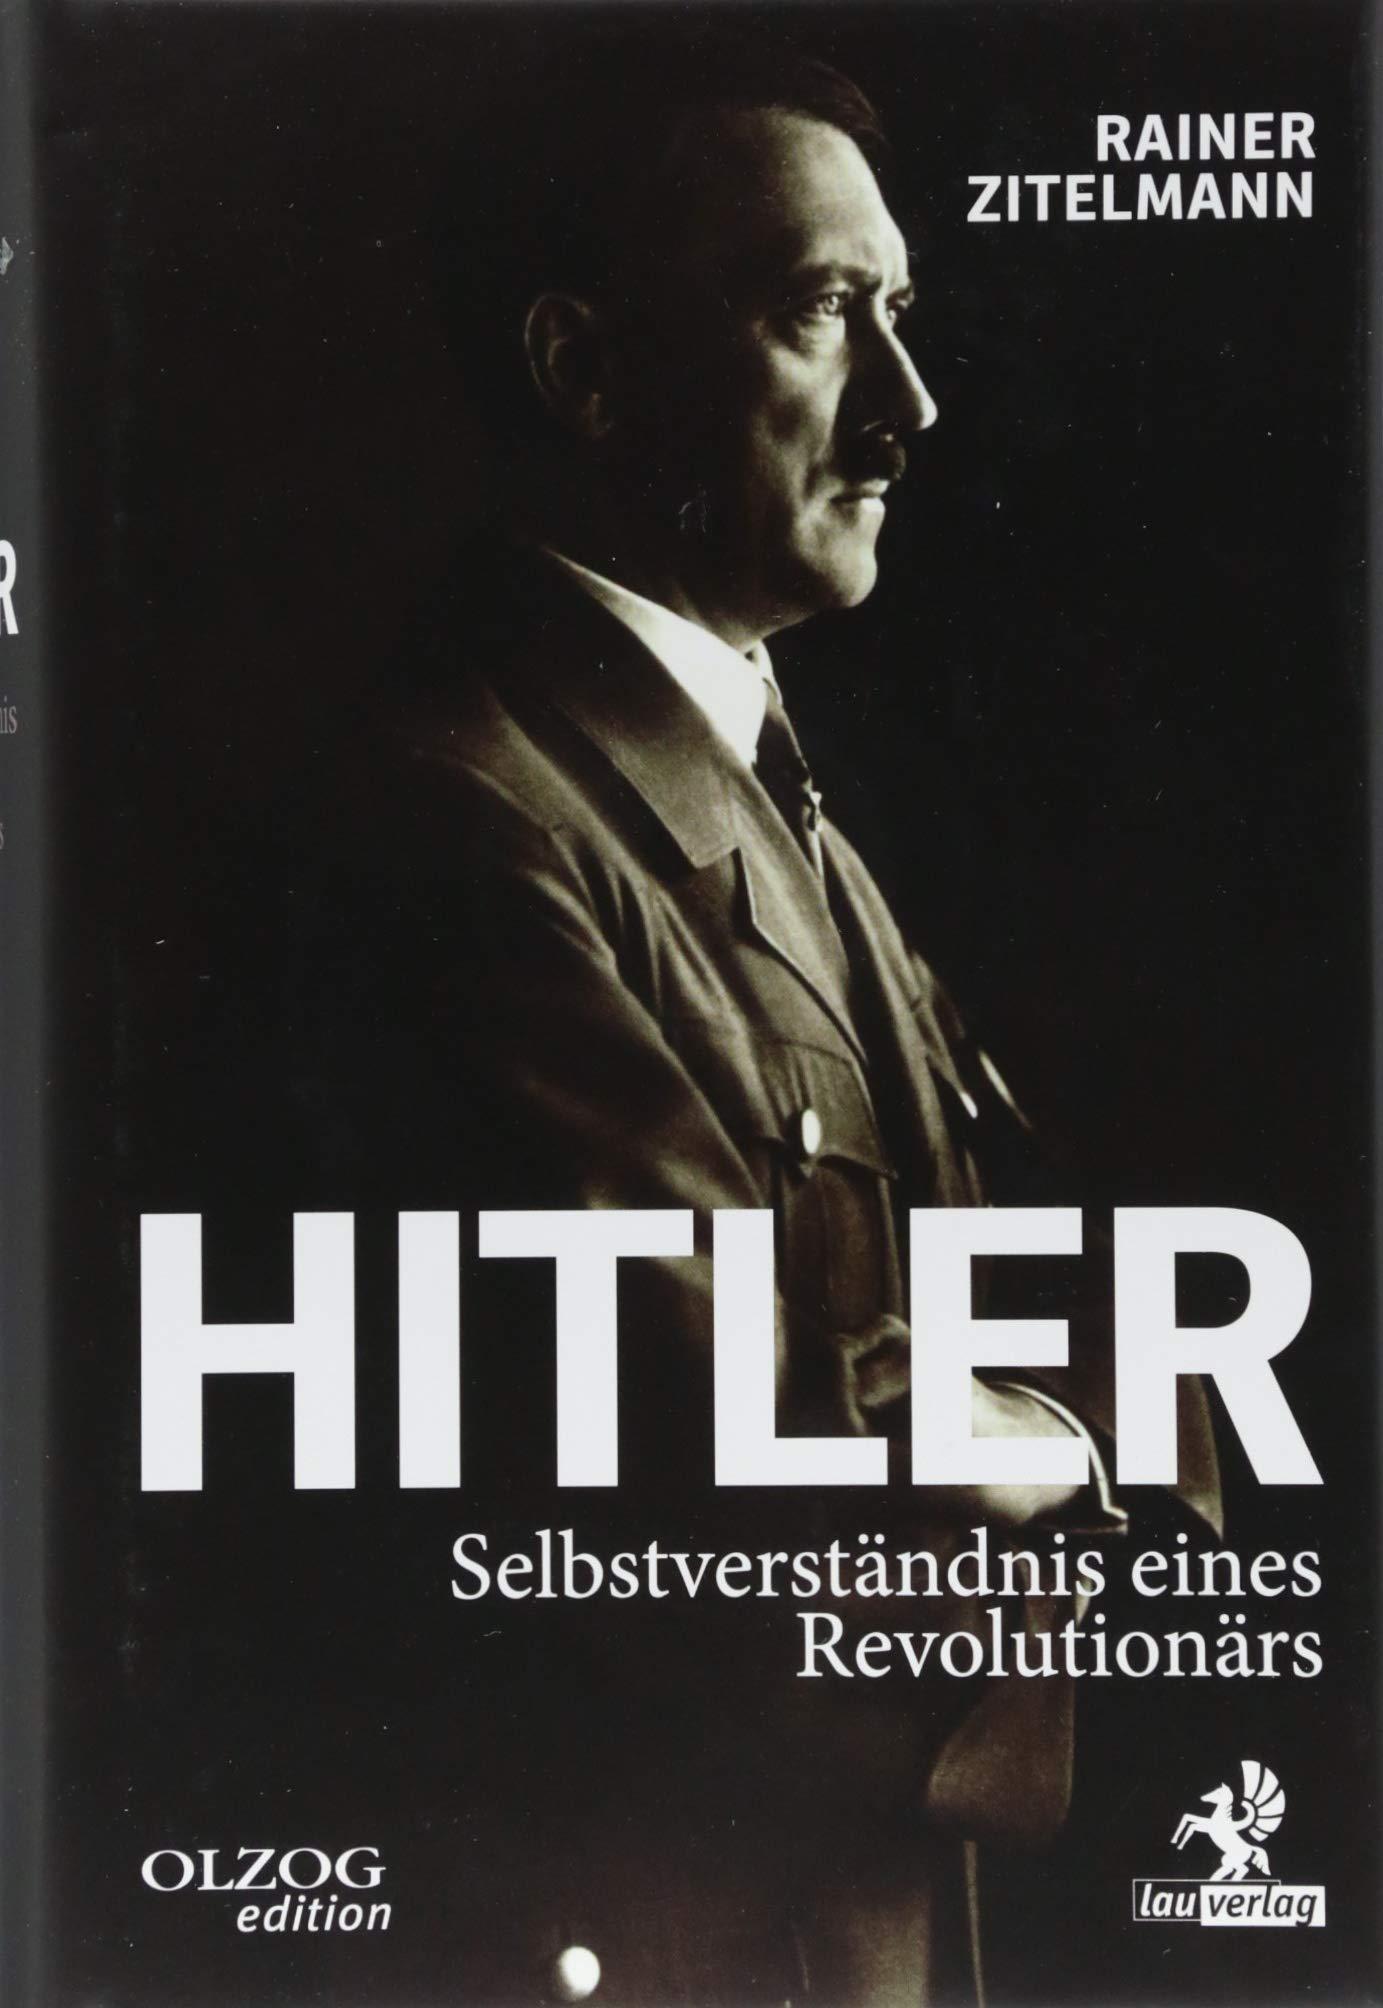 Hitler: Selbstverständnis eines Revolutionärs